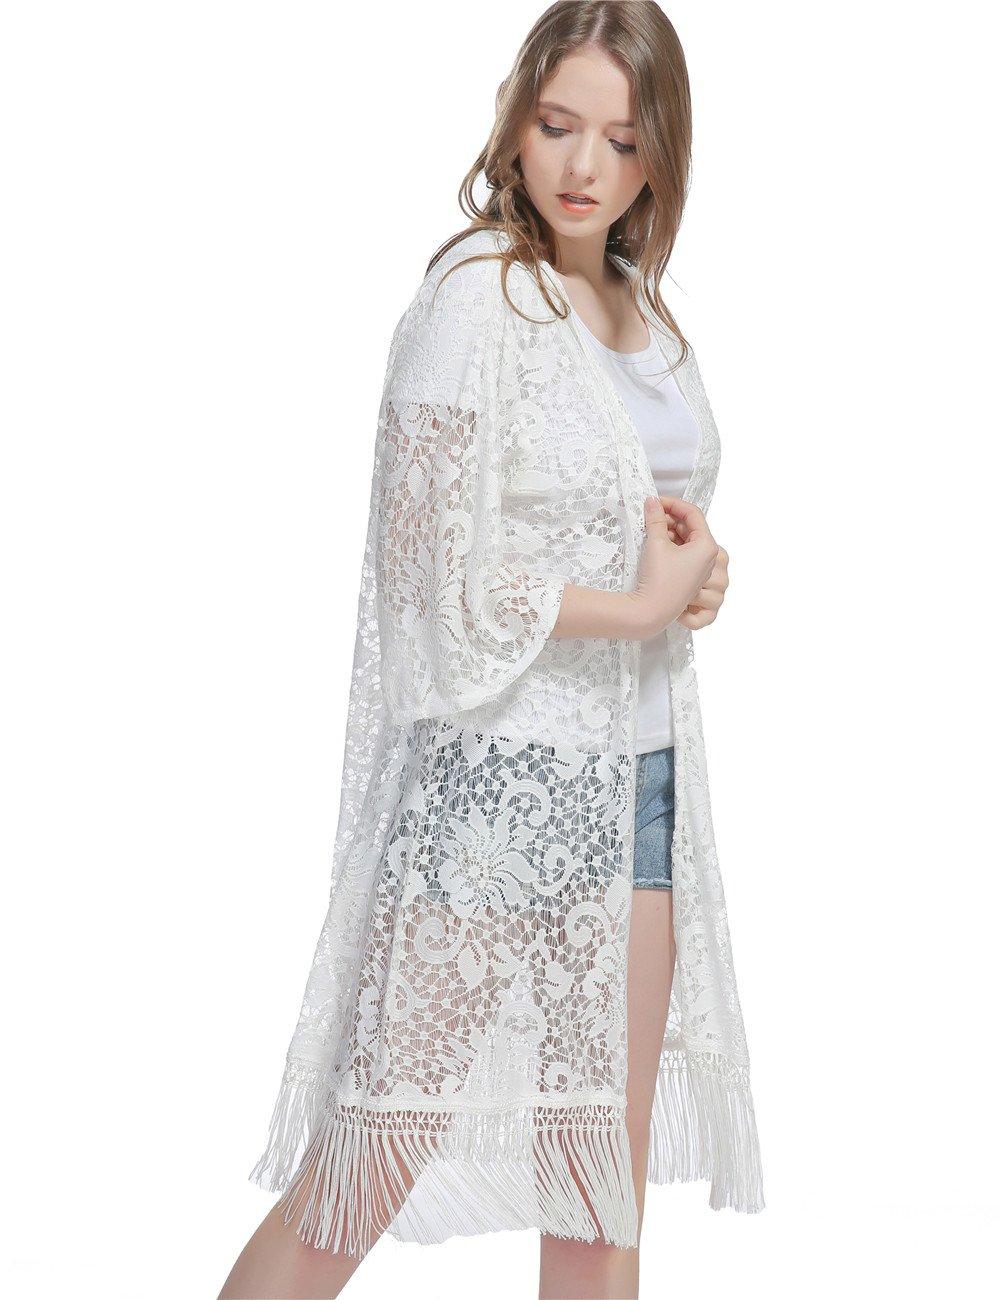 Genovega Lace Women's Beach Kimono Cover up – Summer Sleeve White Soft Crochet Ruana Bikini Cover Swimwear Swimsuit Coverup Dress Summer Beach Outfit for Ladies